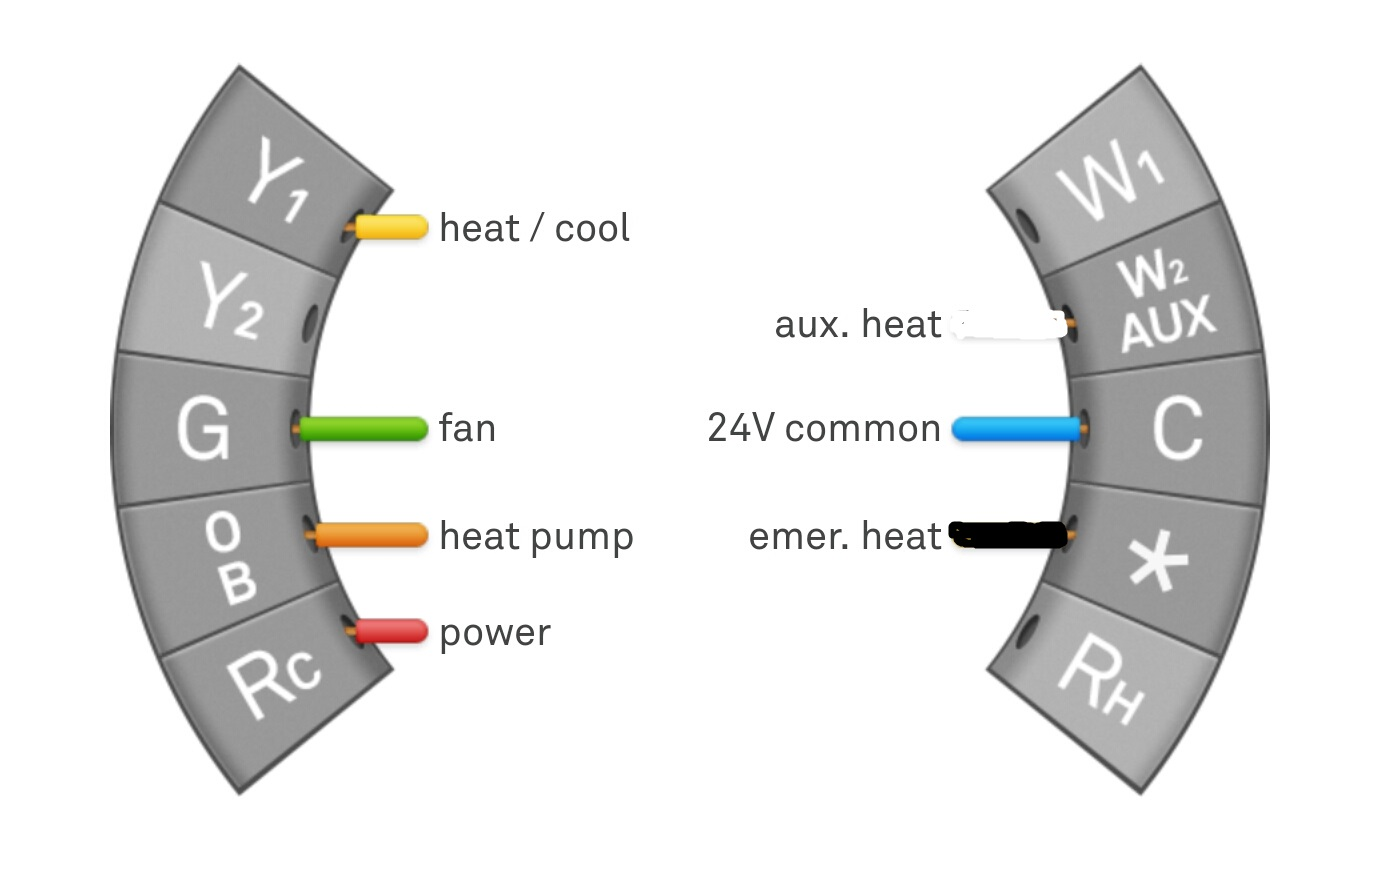 ac thermostat wiring diagram dpdt [ 1375 x 872 Pixel ]